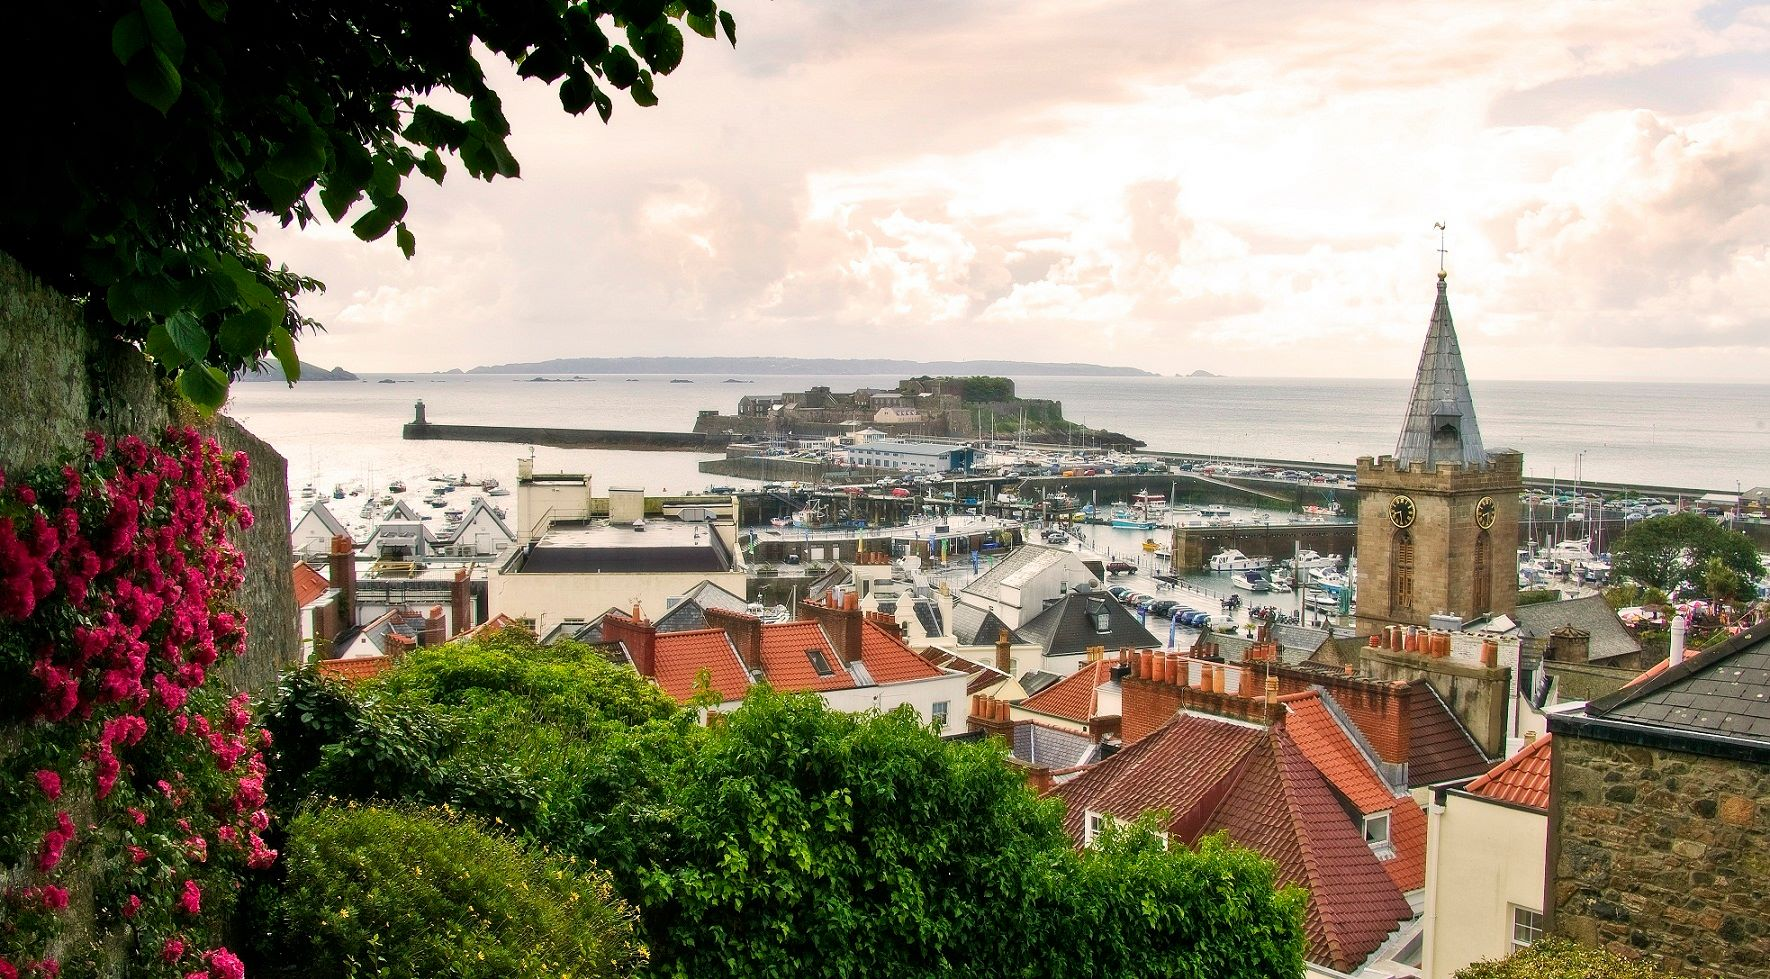 Les îles anglo-normandes Jersey Guernesey depuis Carteret